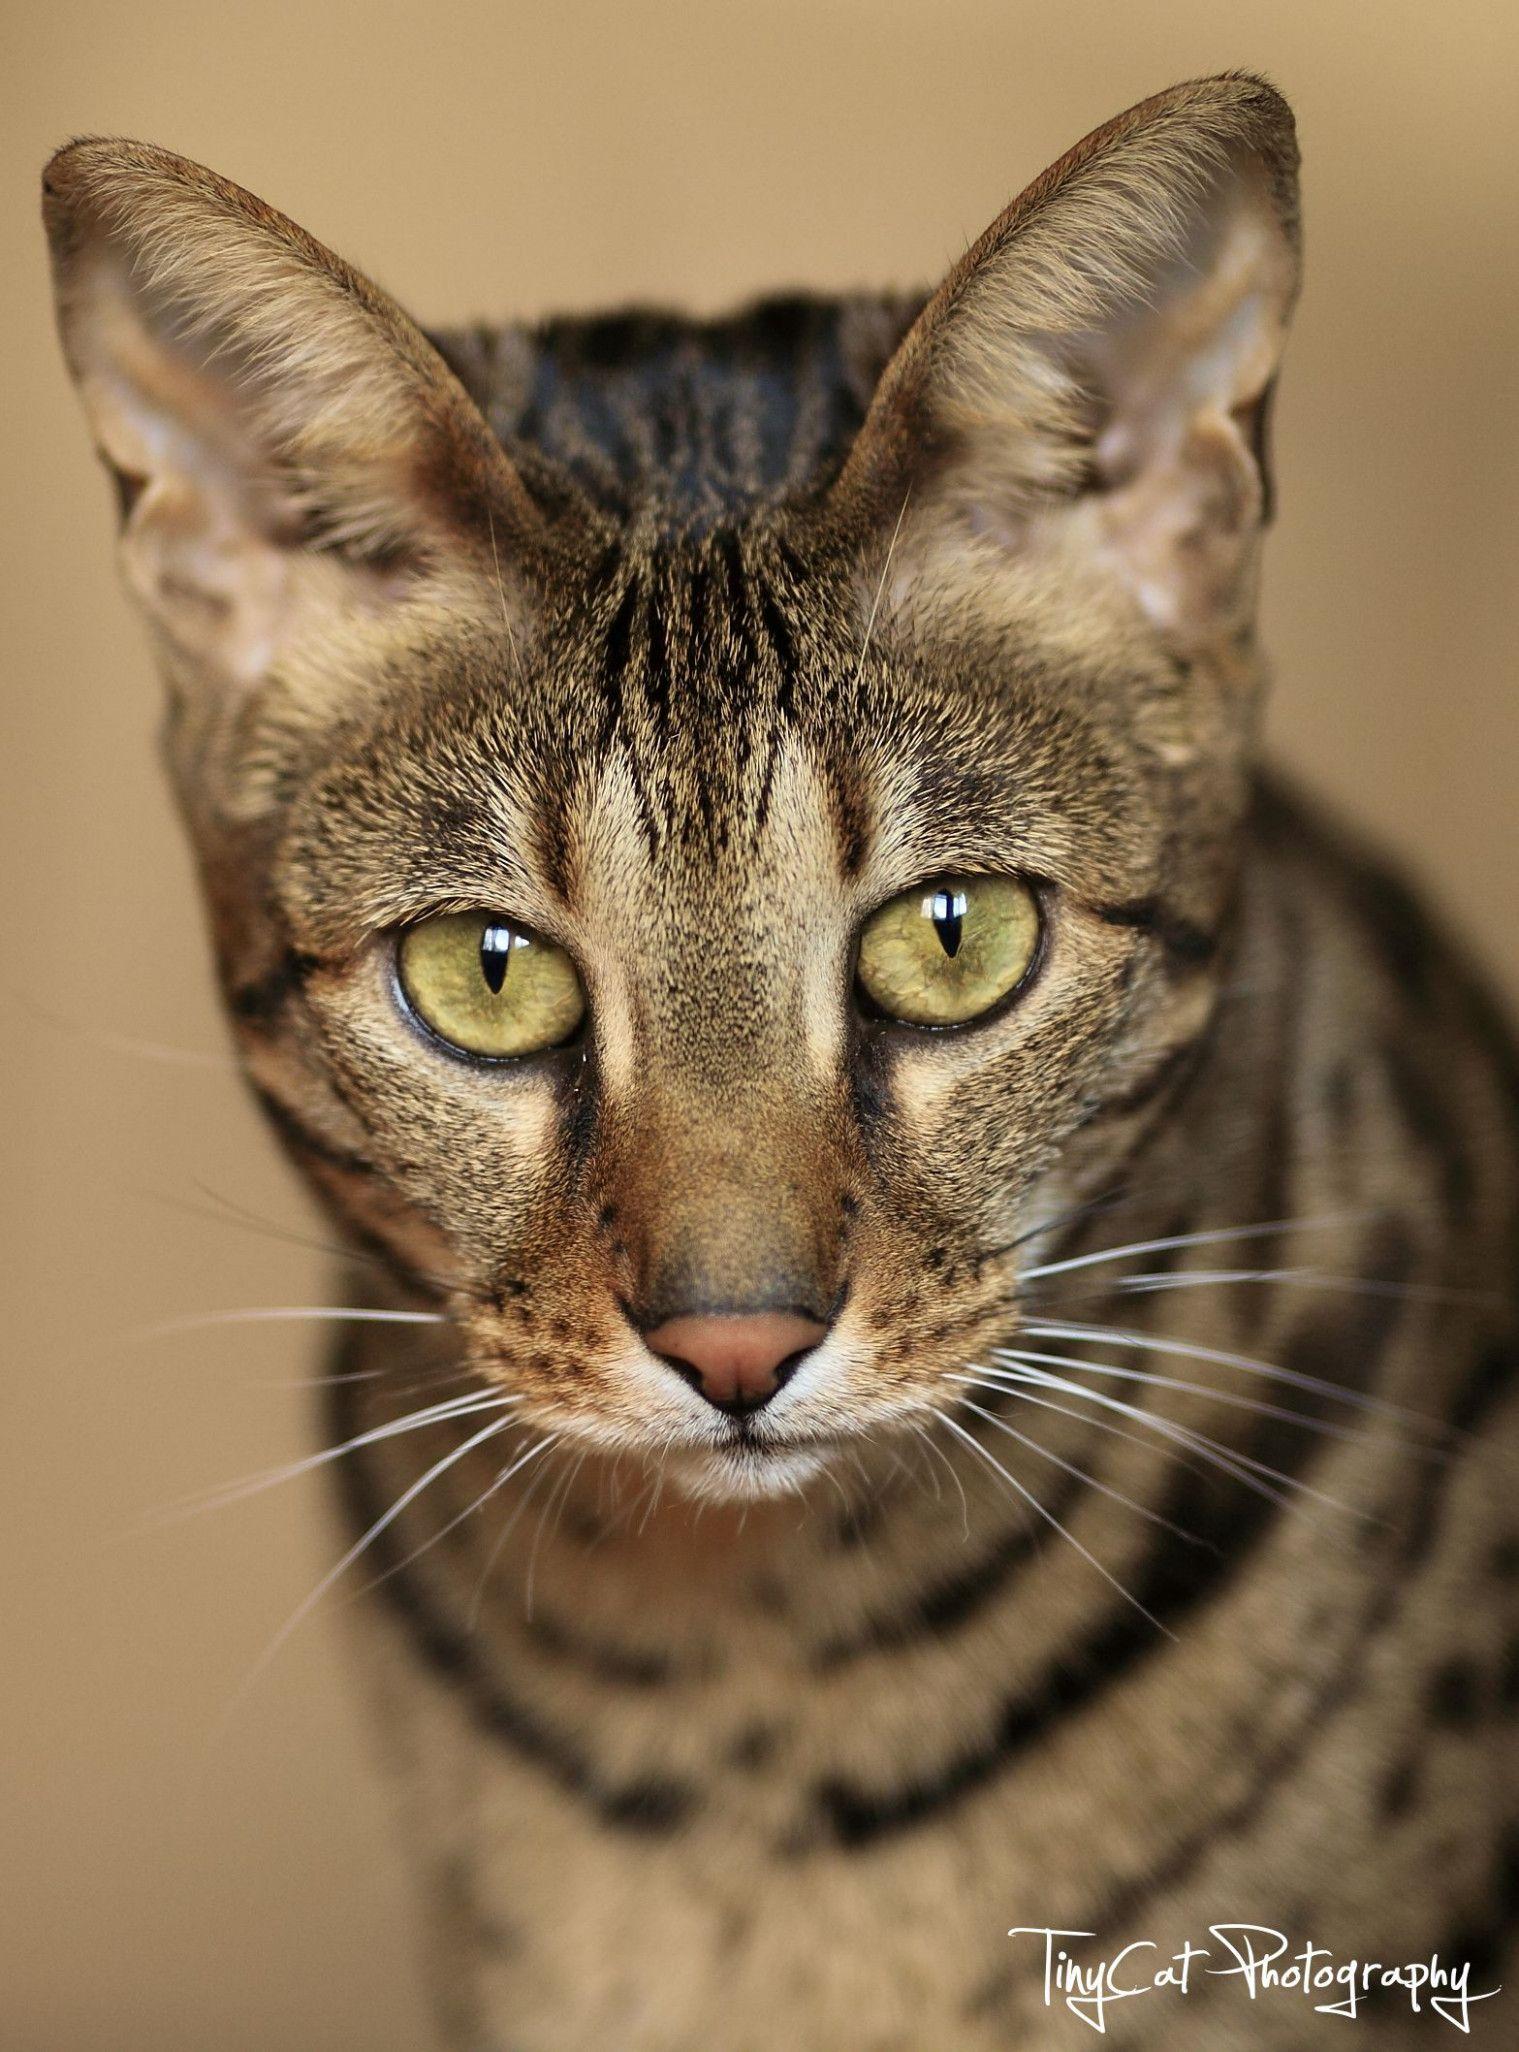 9 Cute Savannah Cat Average Price In 2020 African Serval Cat Savannah Cat Cats